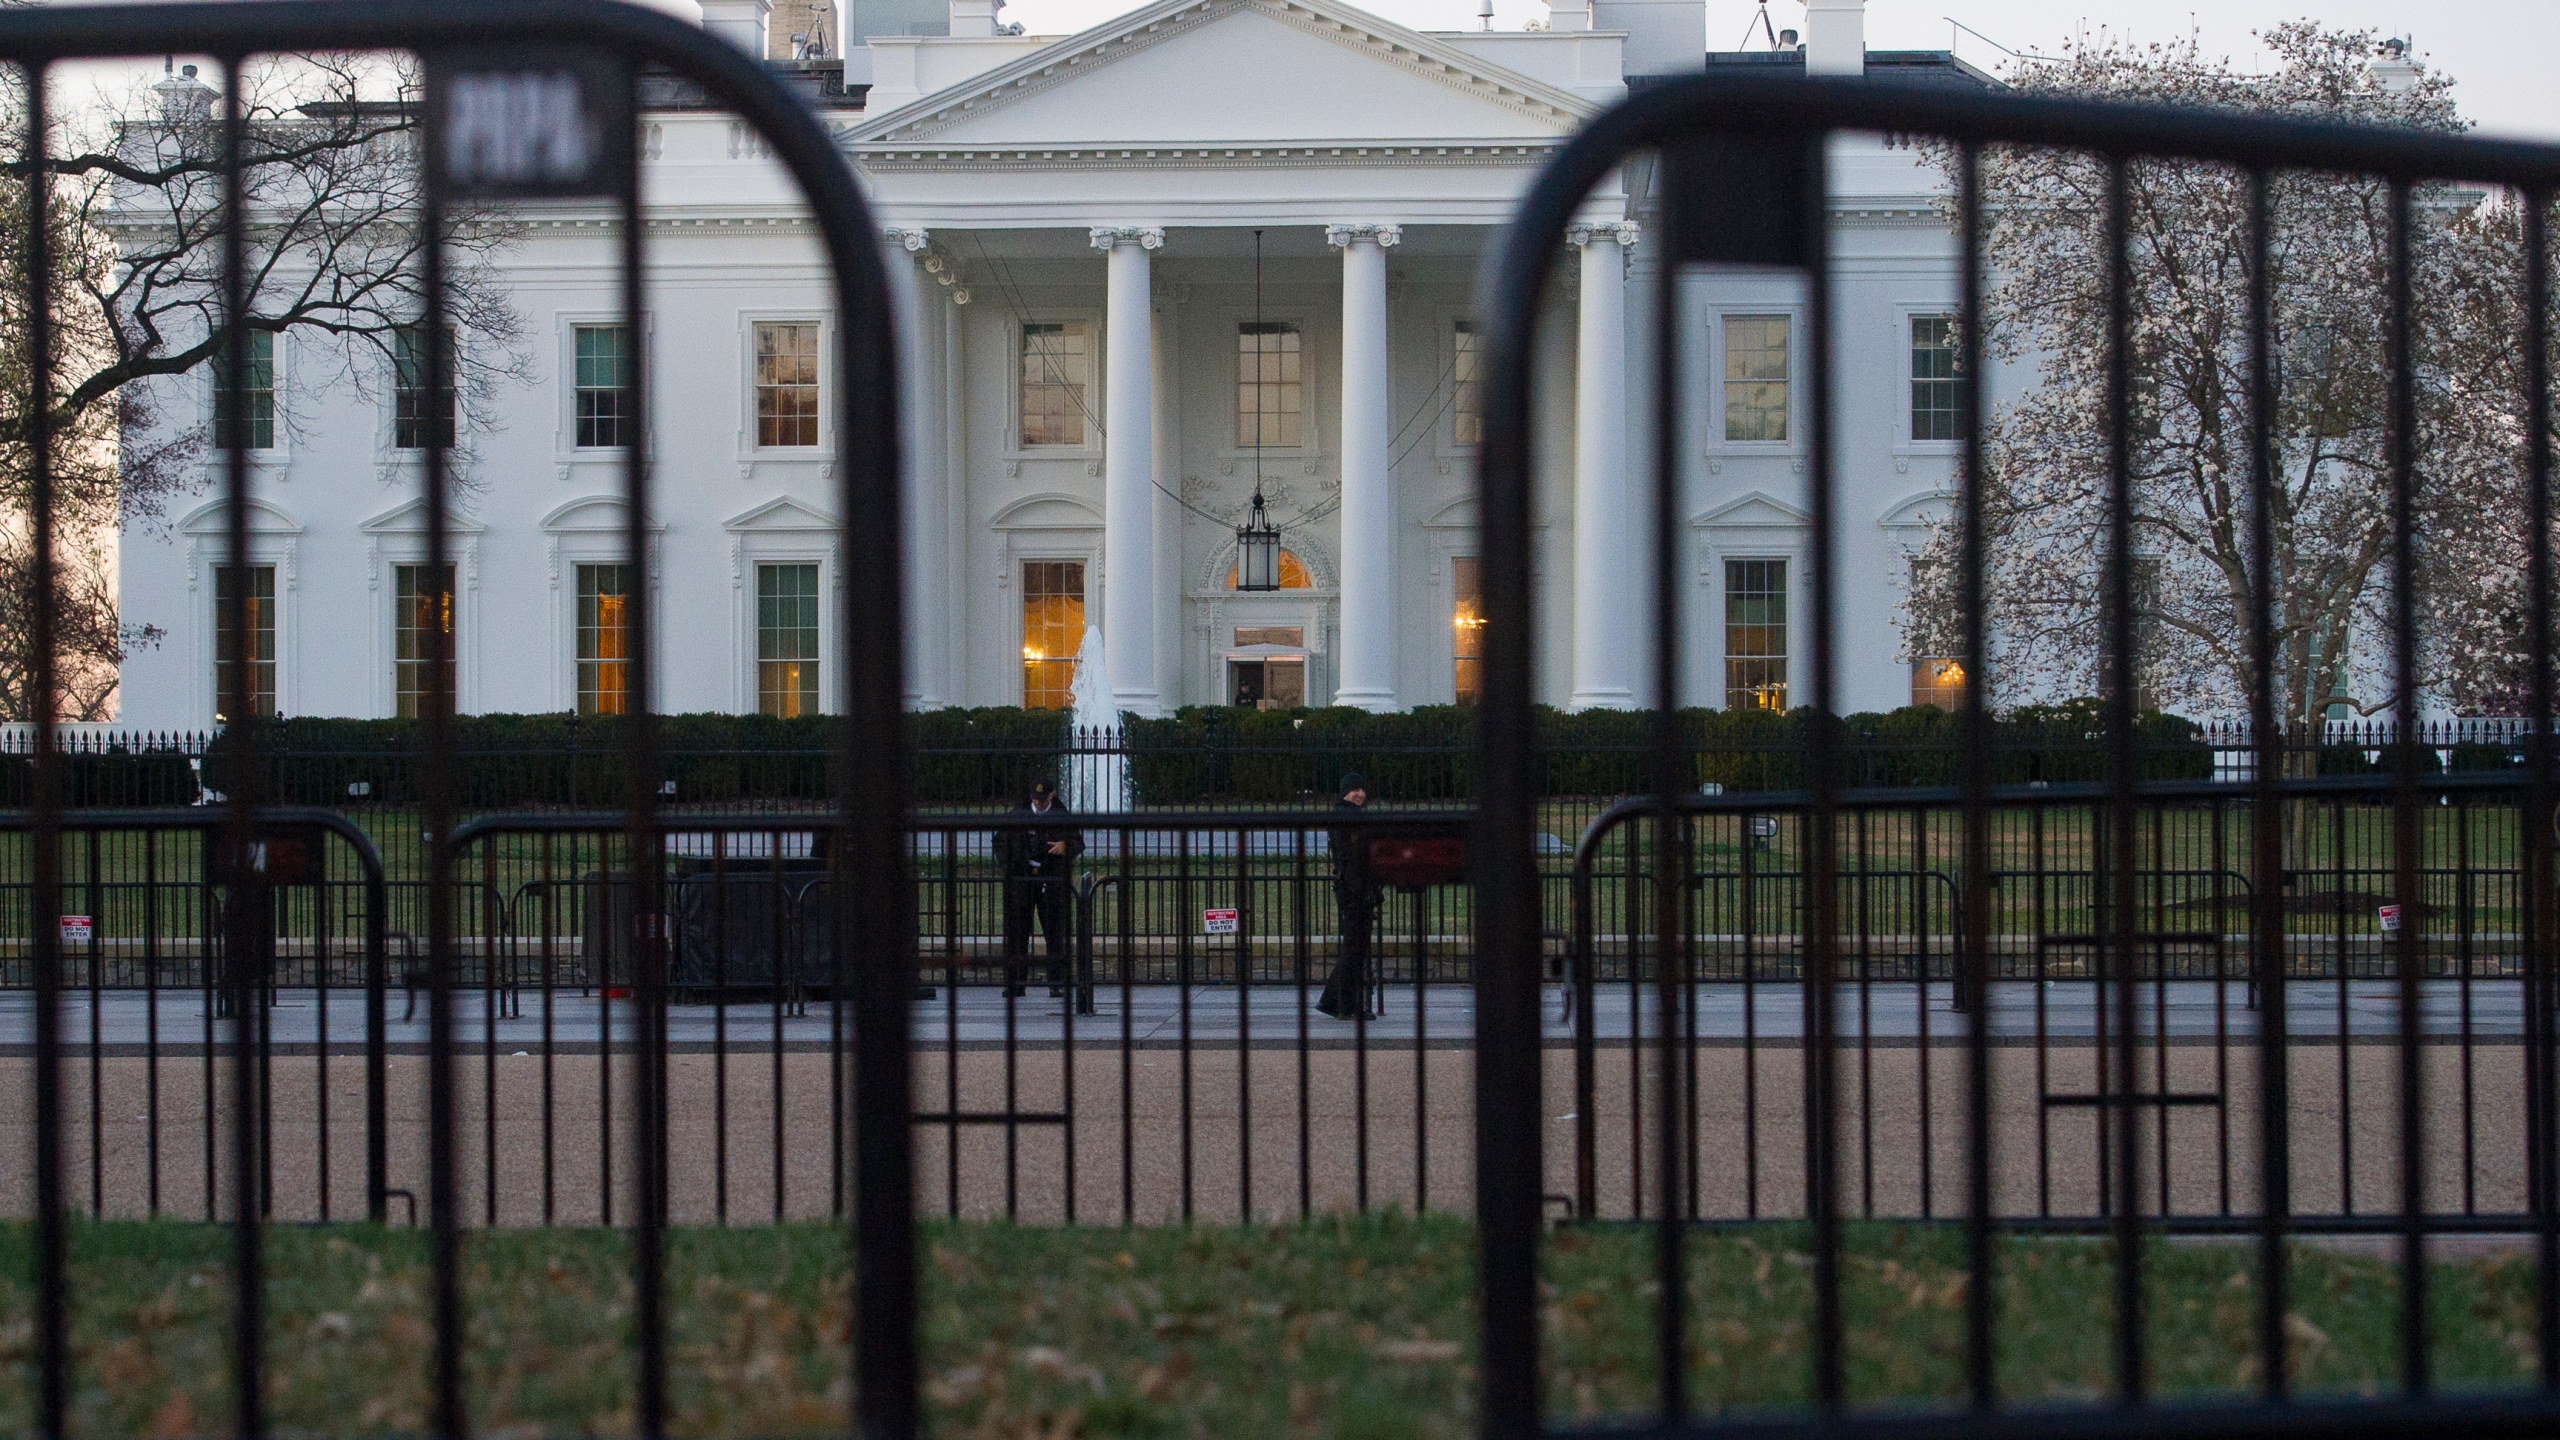 White_House_Security_Clearances_19506-159532.jpg44812184